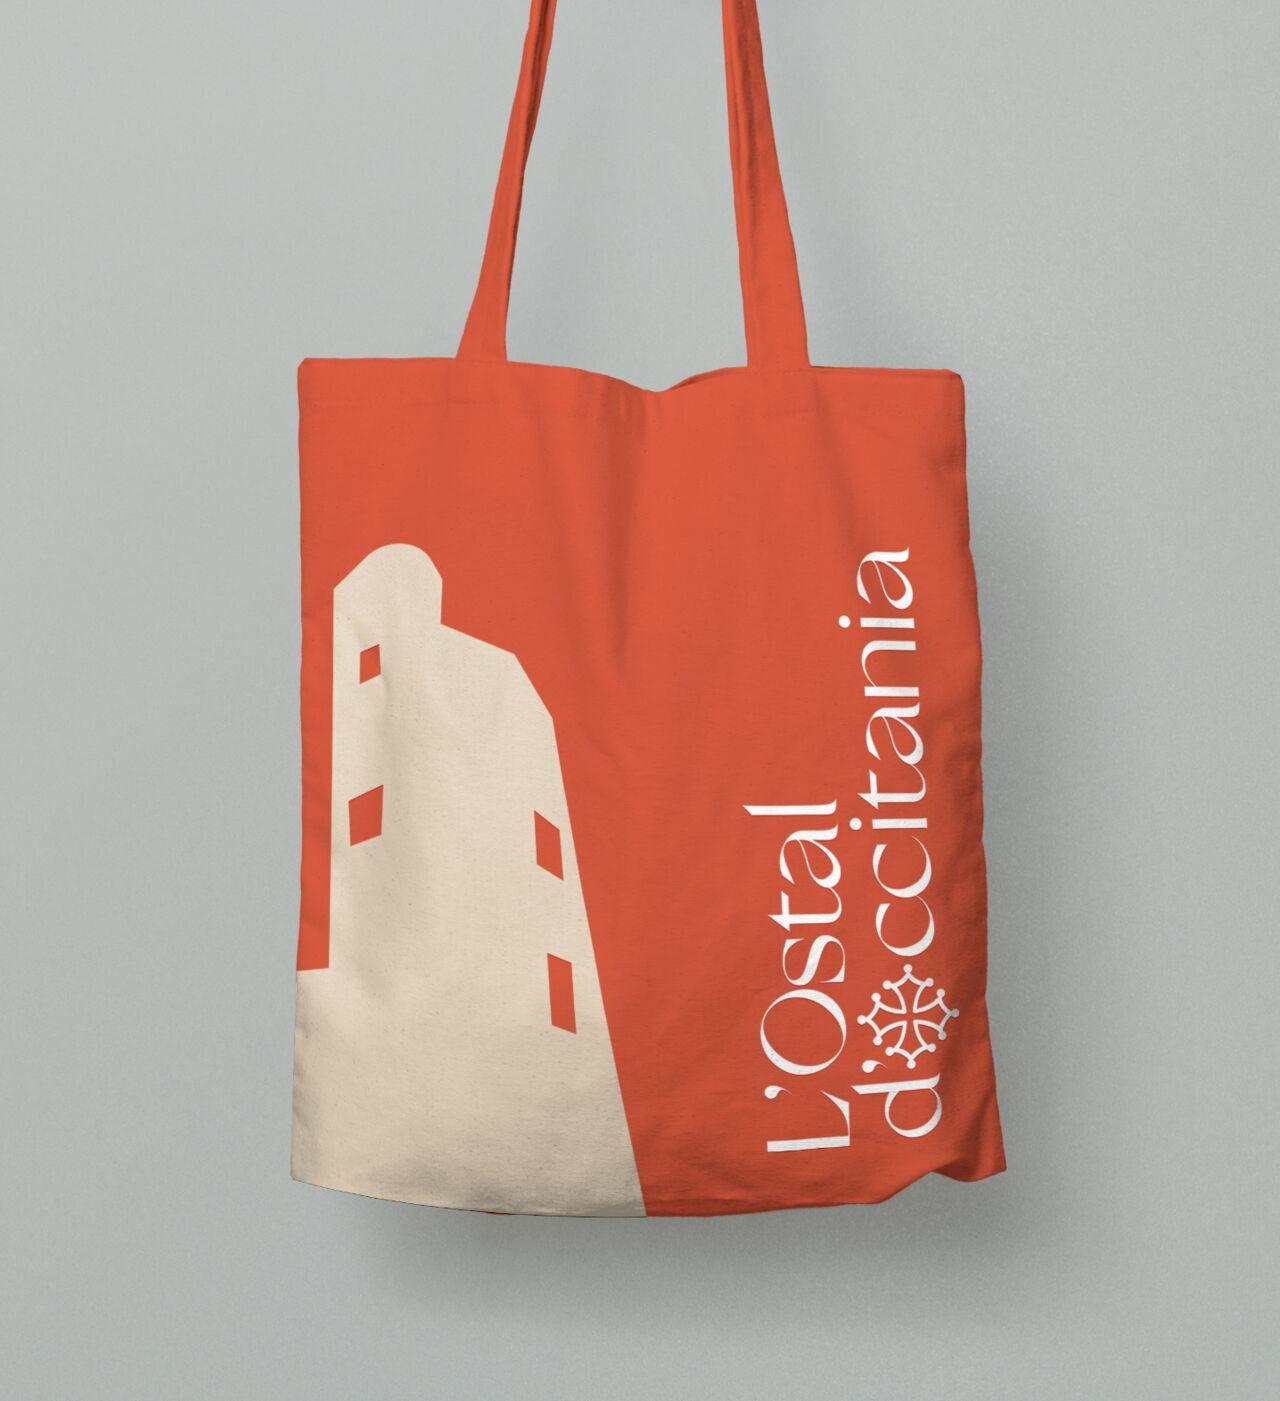 Branding - Tot bag - Ostal occitania